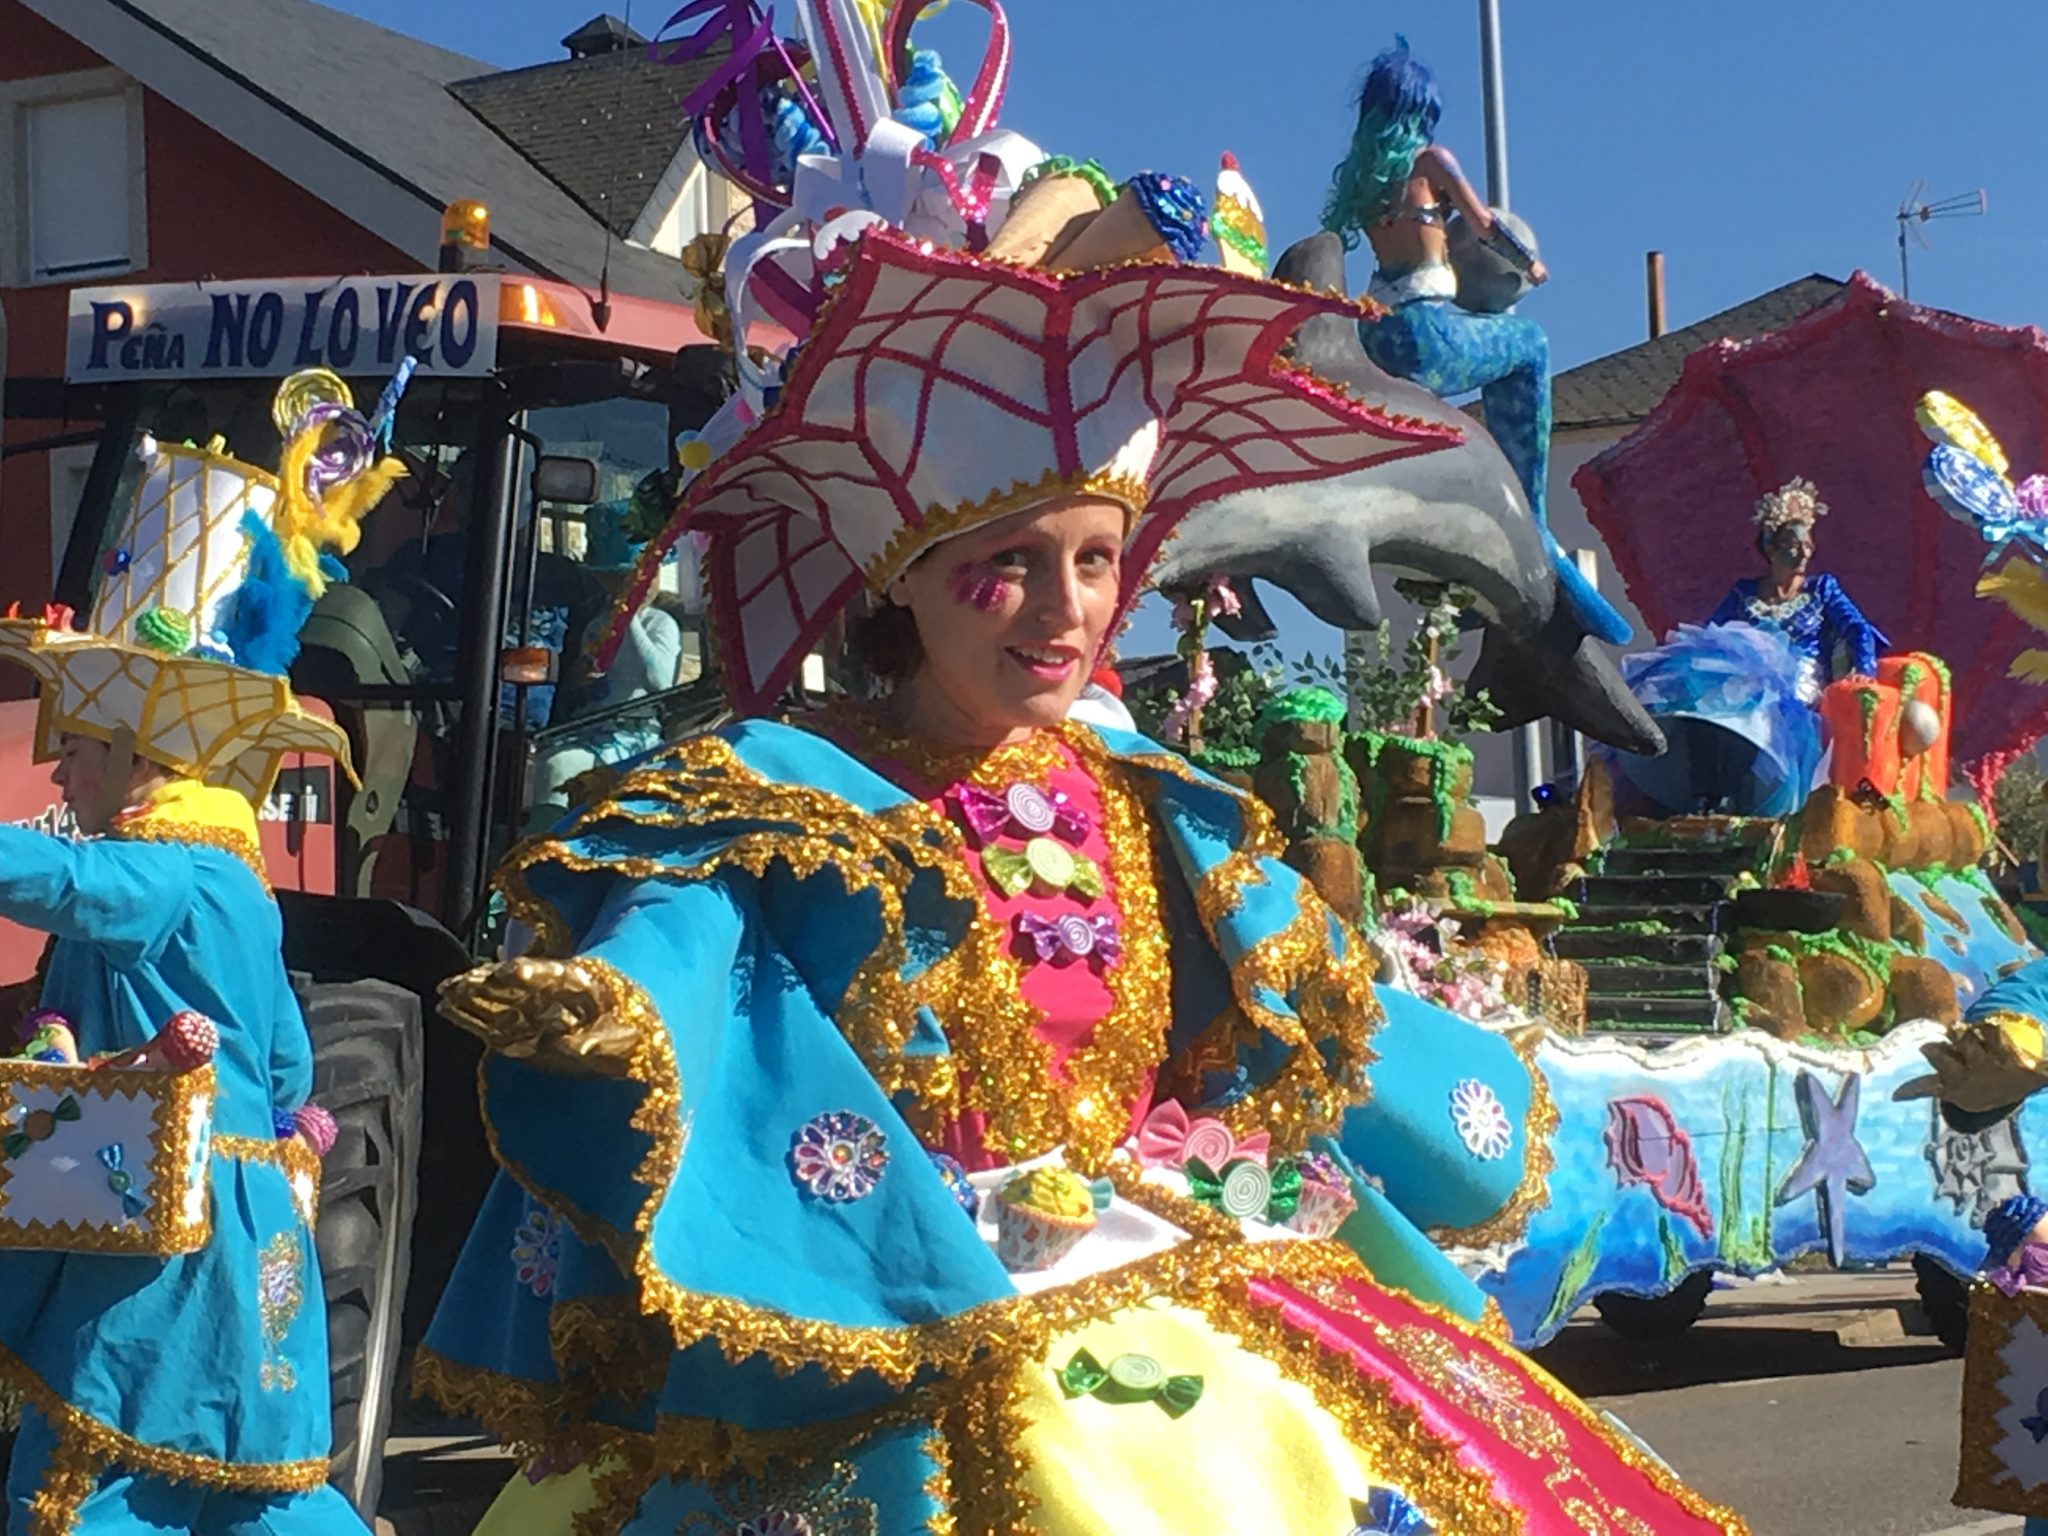 Álbum de fotos Carnaval Cabañas Raras 2019 19